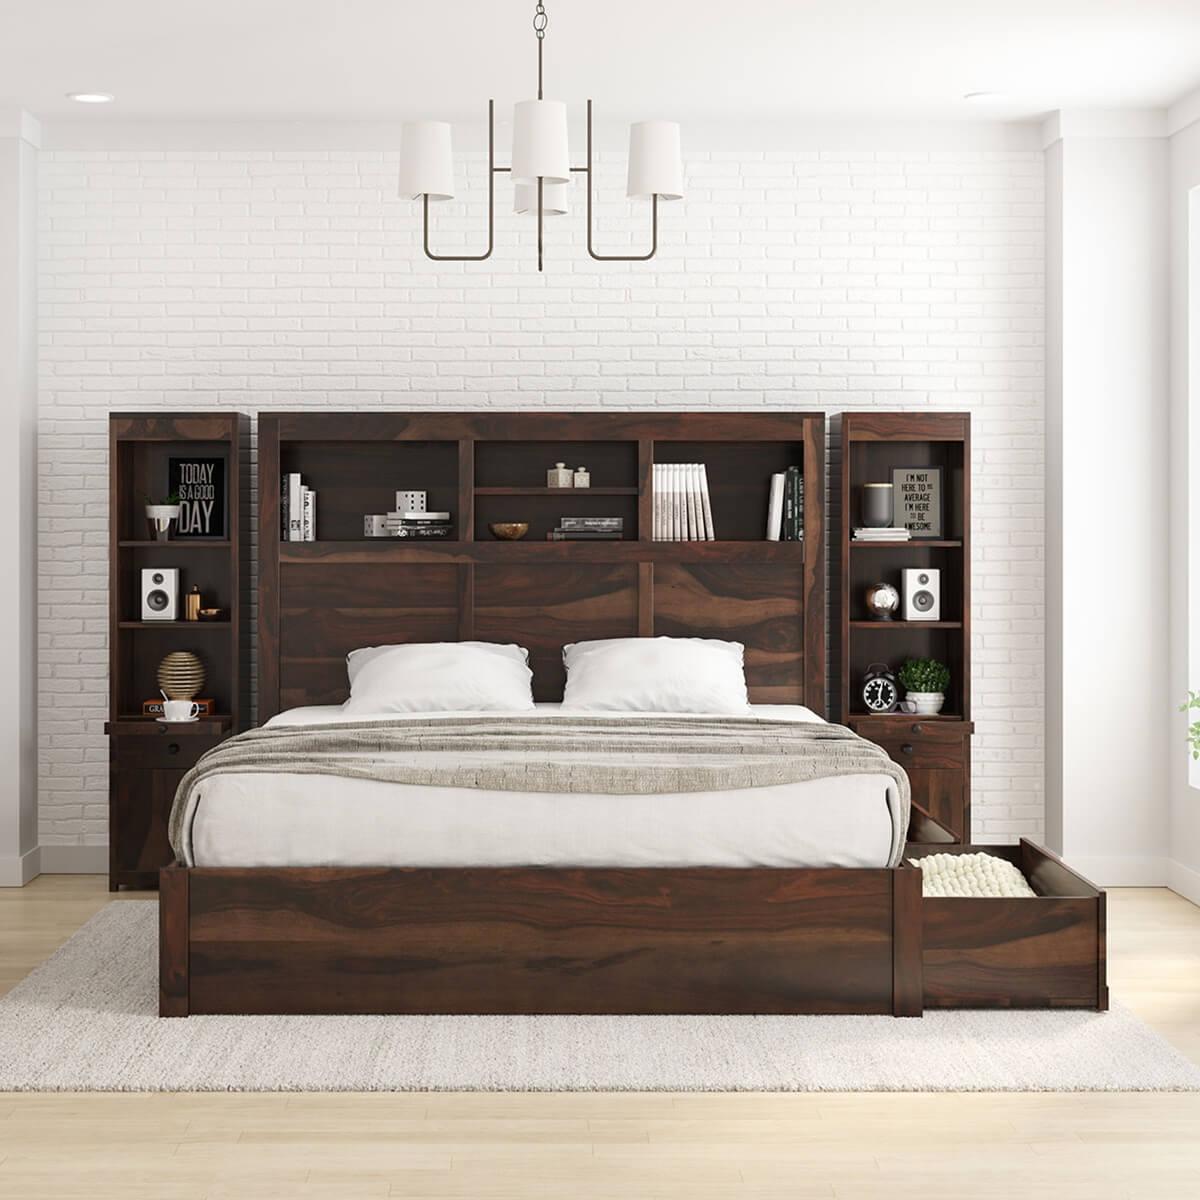 El Centro Solid Wood Storage Platform Bed Frame W Bookcase Headboard